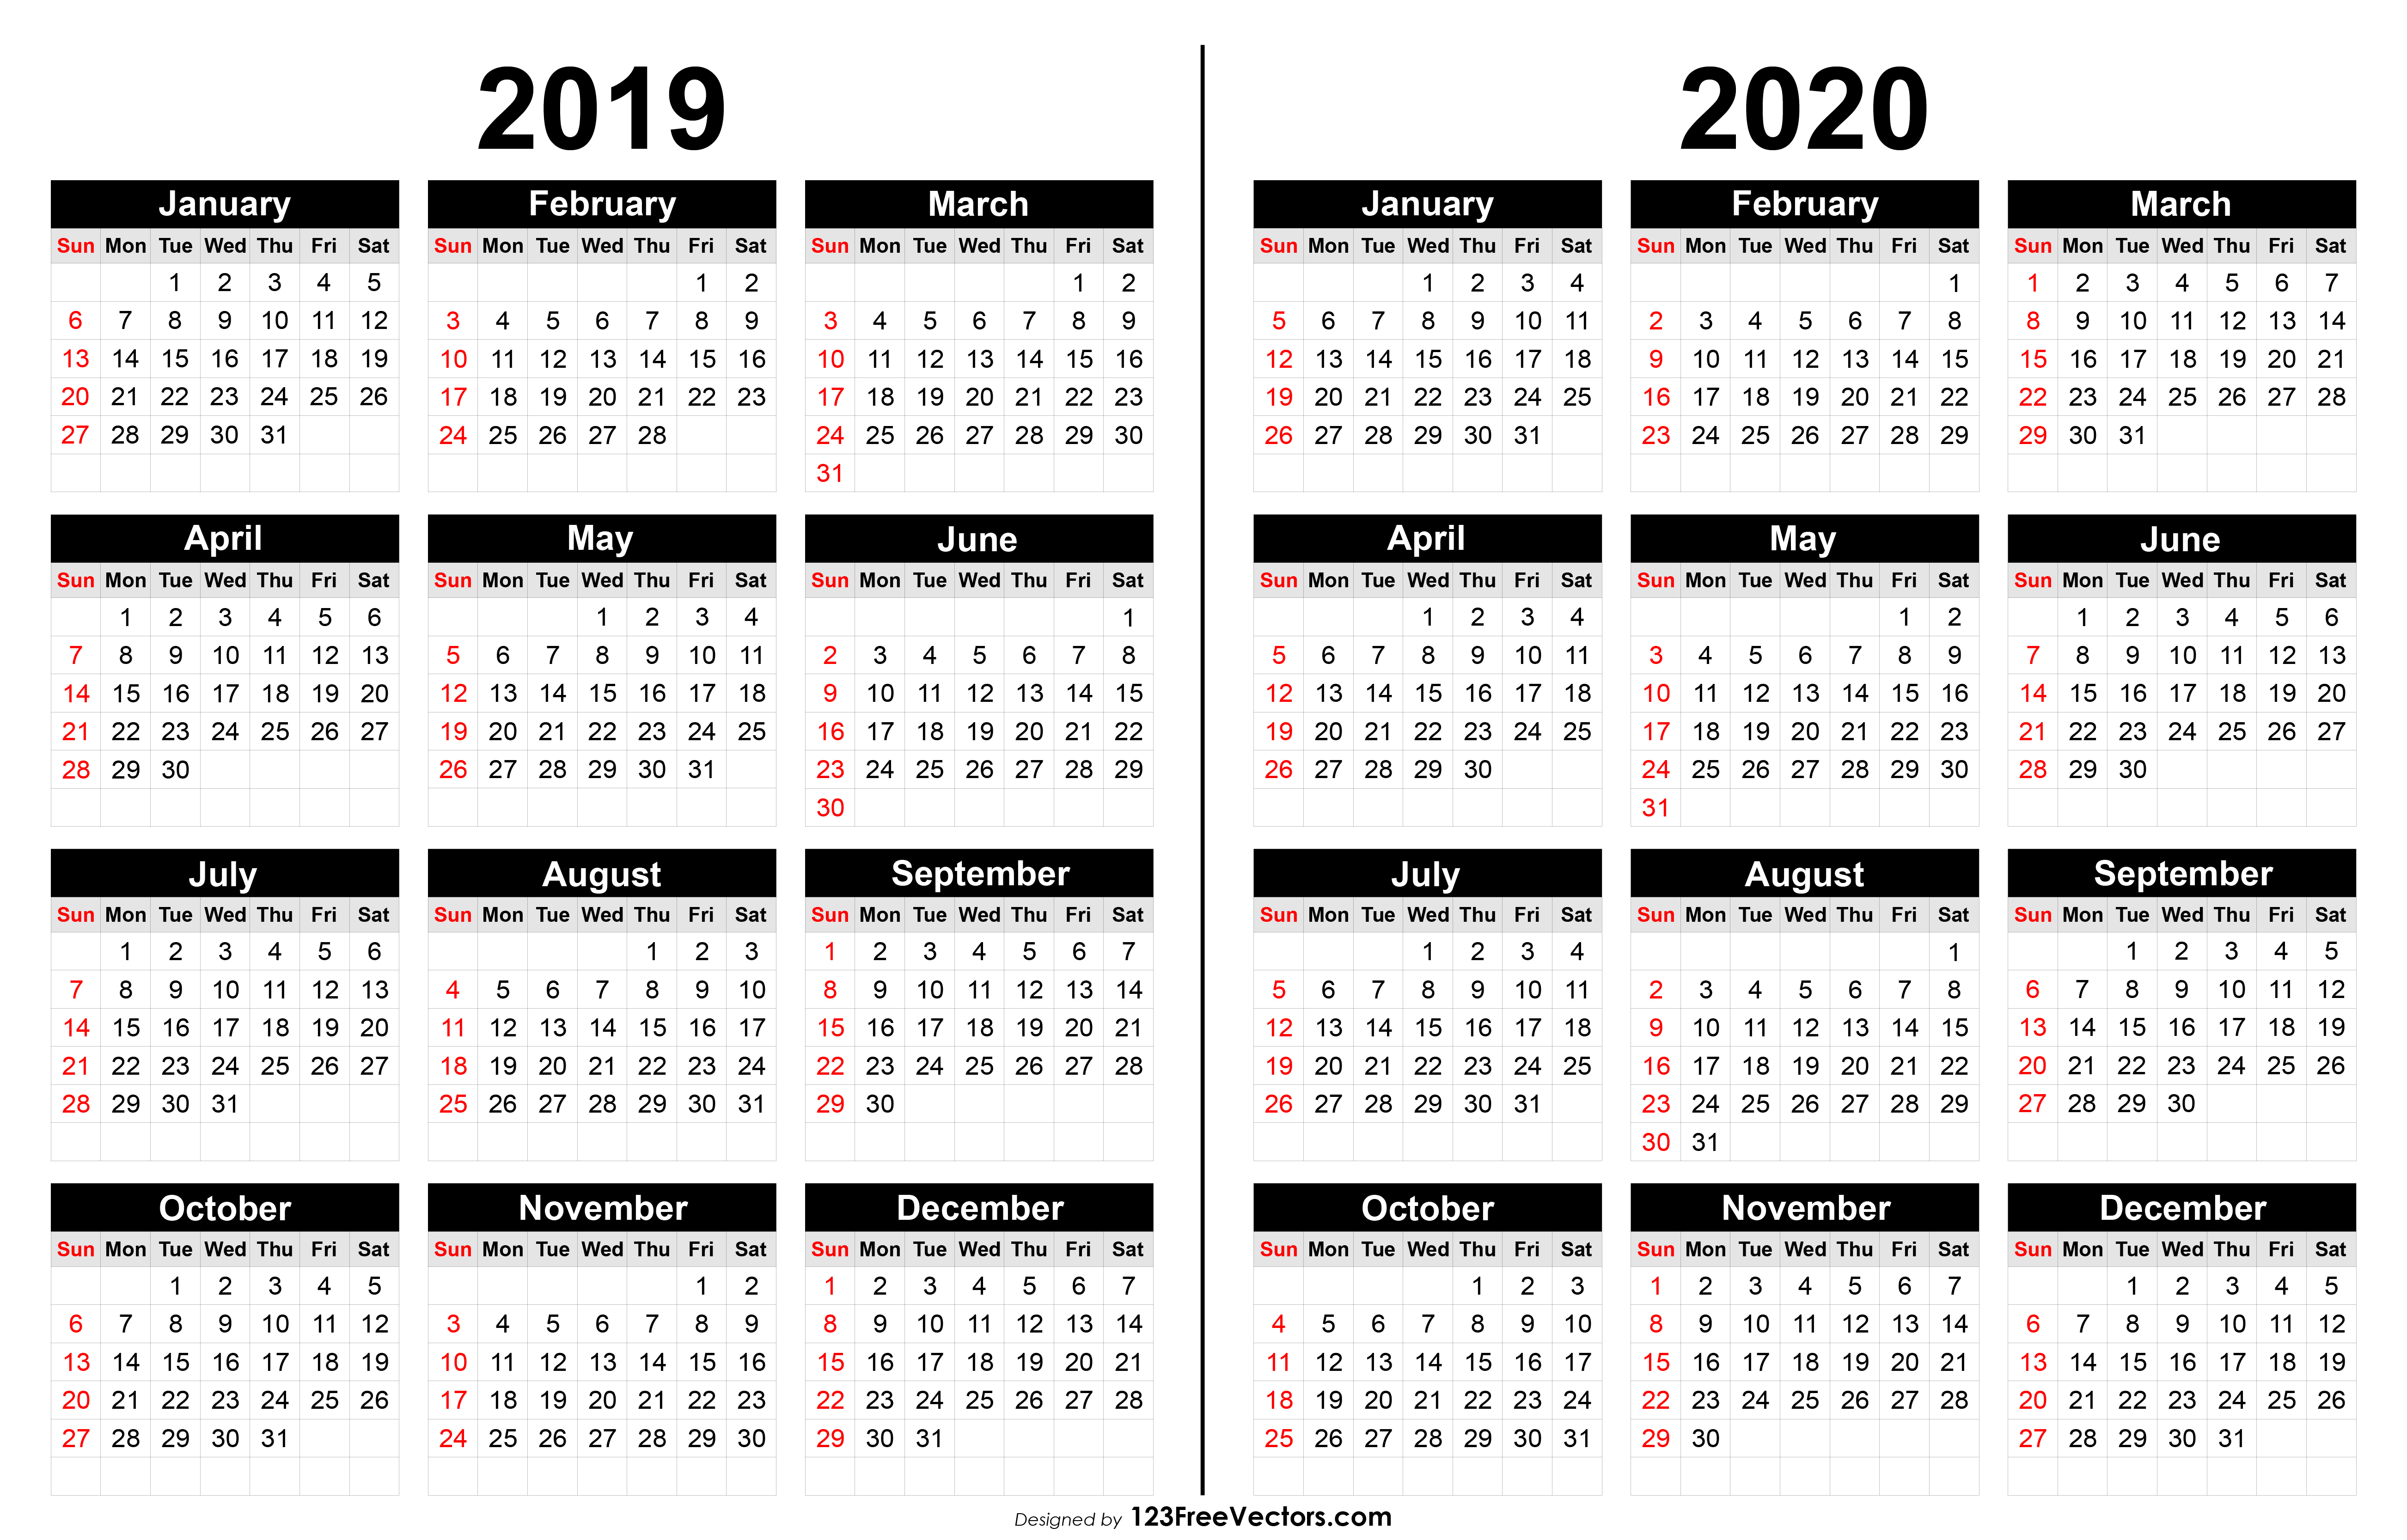 2019 And 2020 Calendar Printable in 2019-2020 Blank Calendar To Print